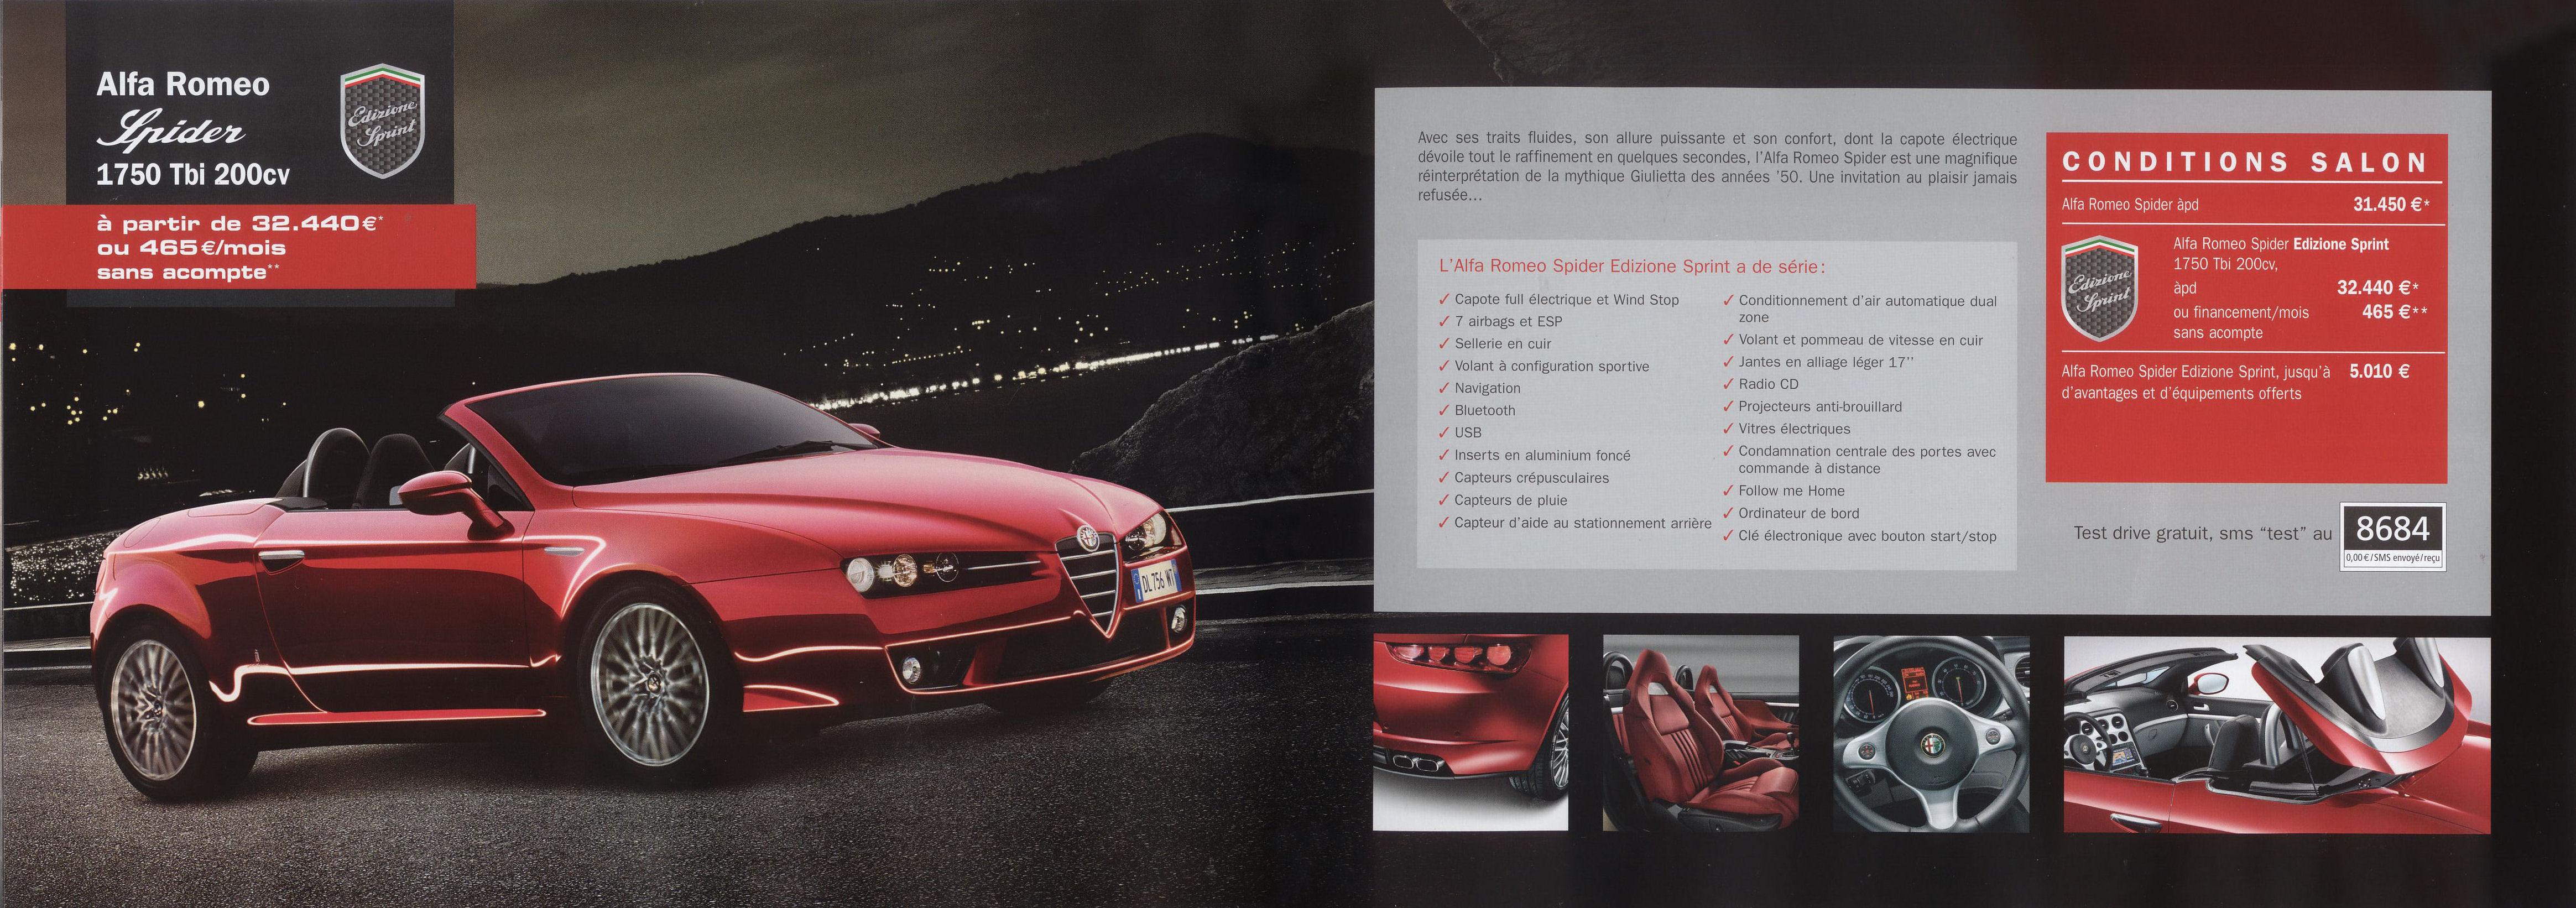 2010 Alfa Romeo brochure